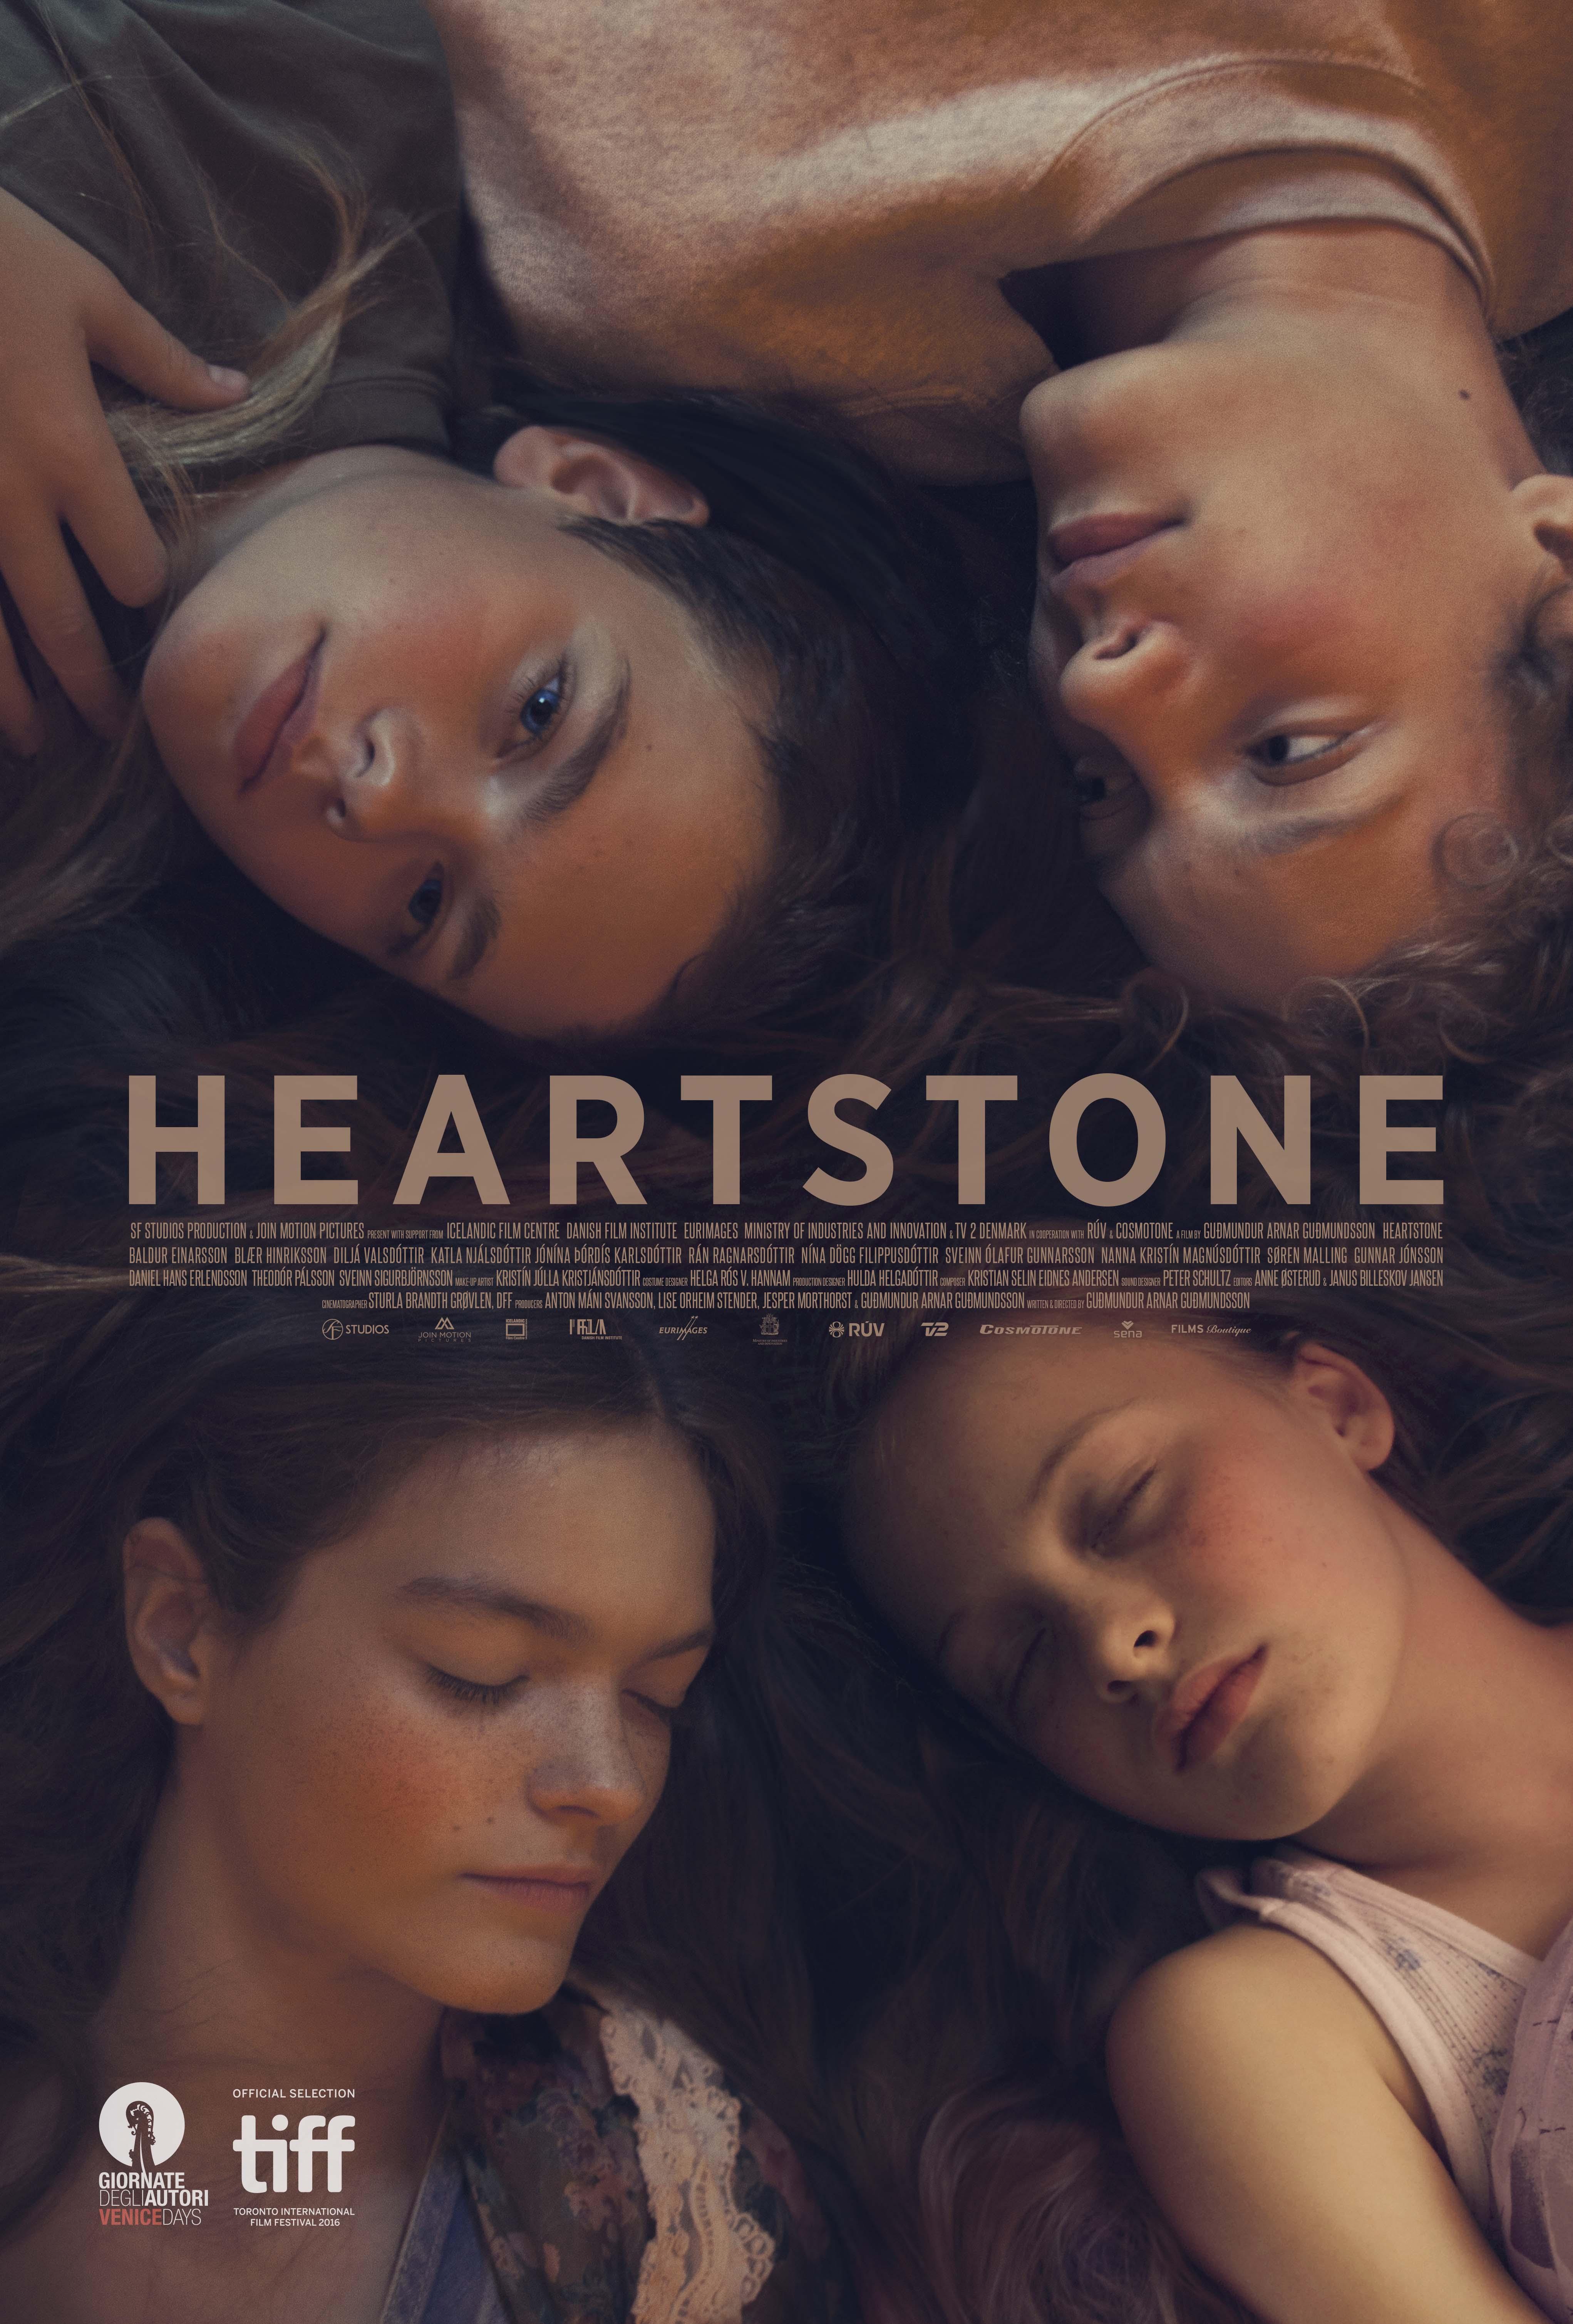 Heartstone Trailer Two Pre Teens Bond In A Small